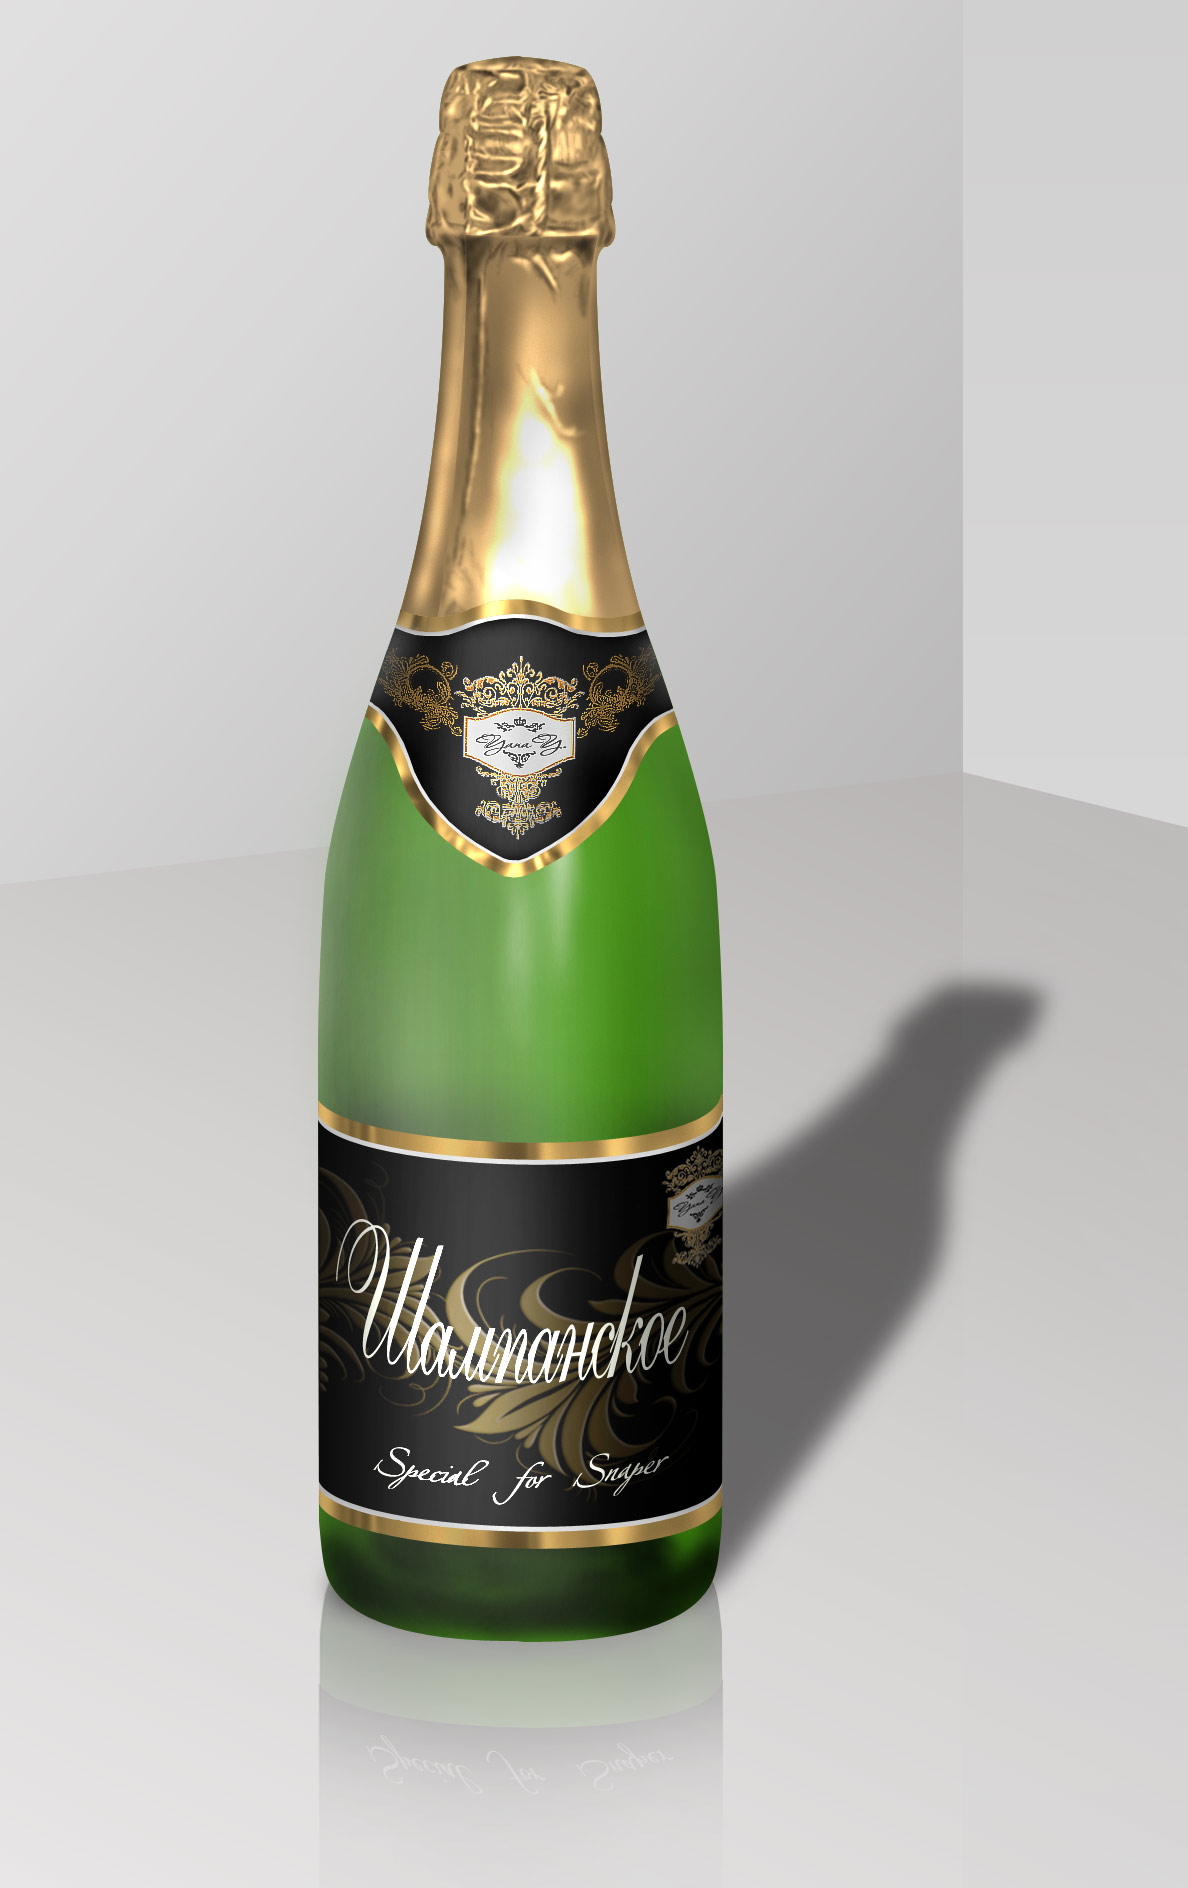 Фото бутылке шампанцкава 1 фотография